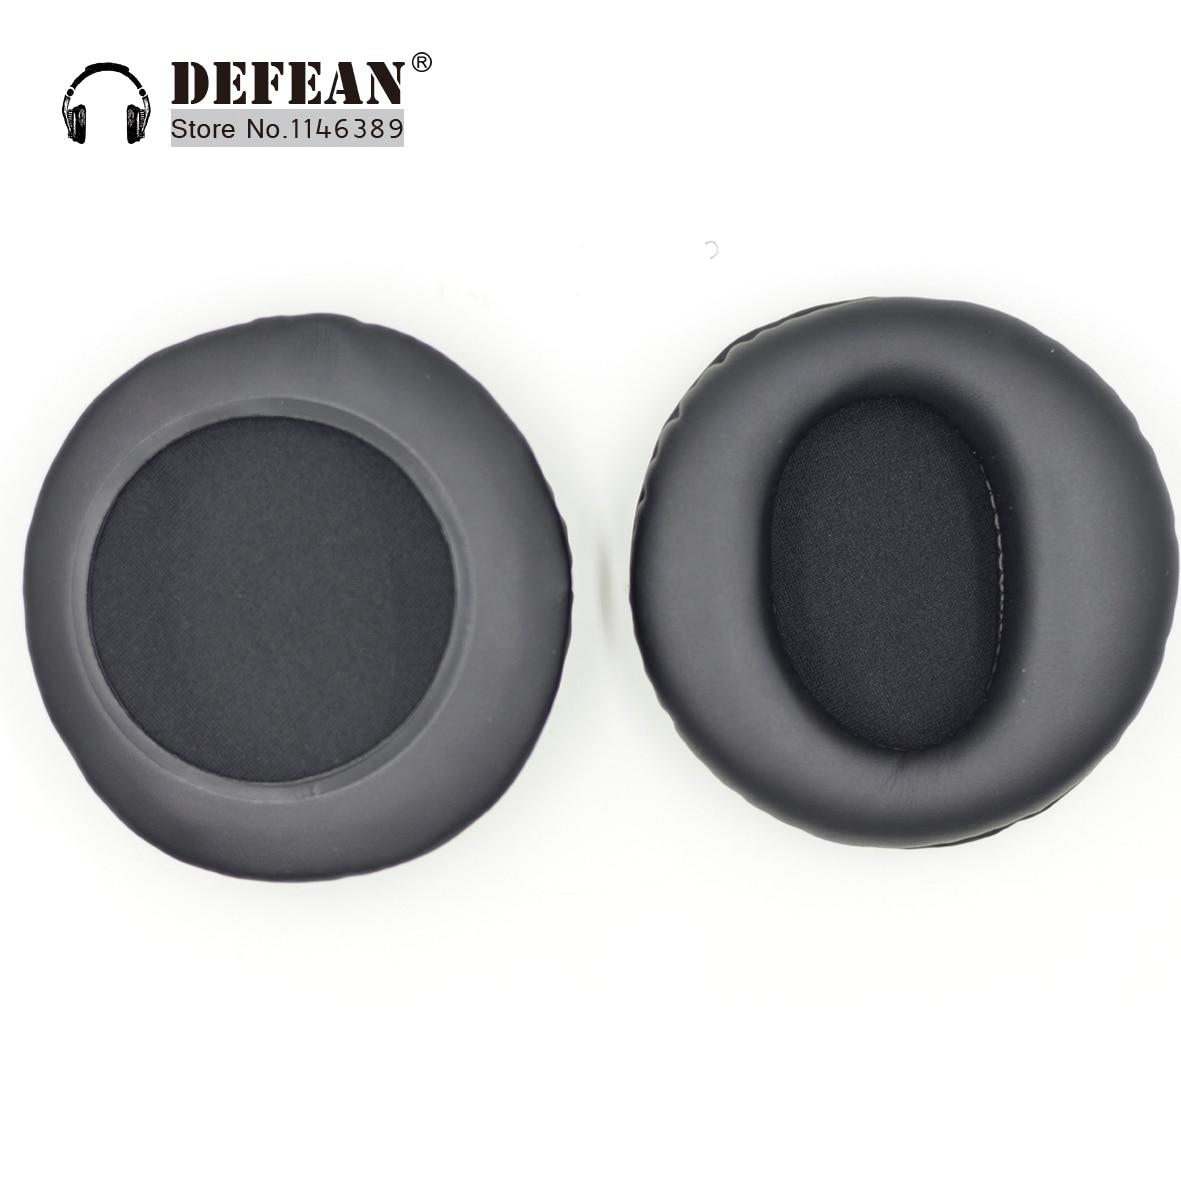 1 Paar Ersatz Ohrpolster Kissen Headset Ear Pad für Sony MDR-XD100 Kopfhörer